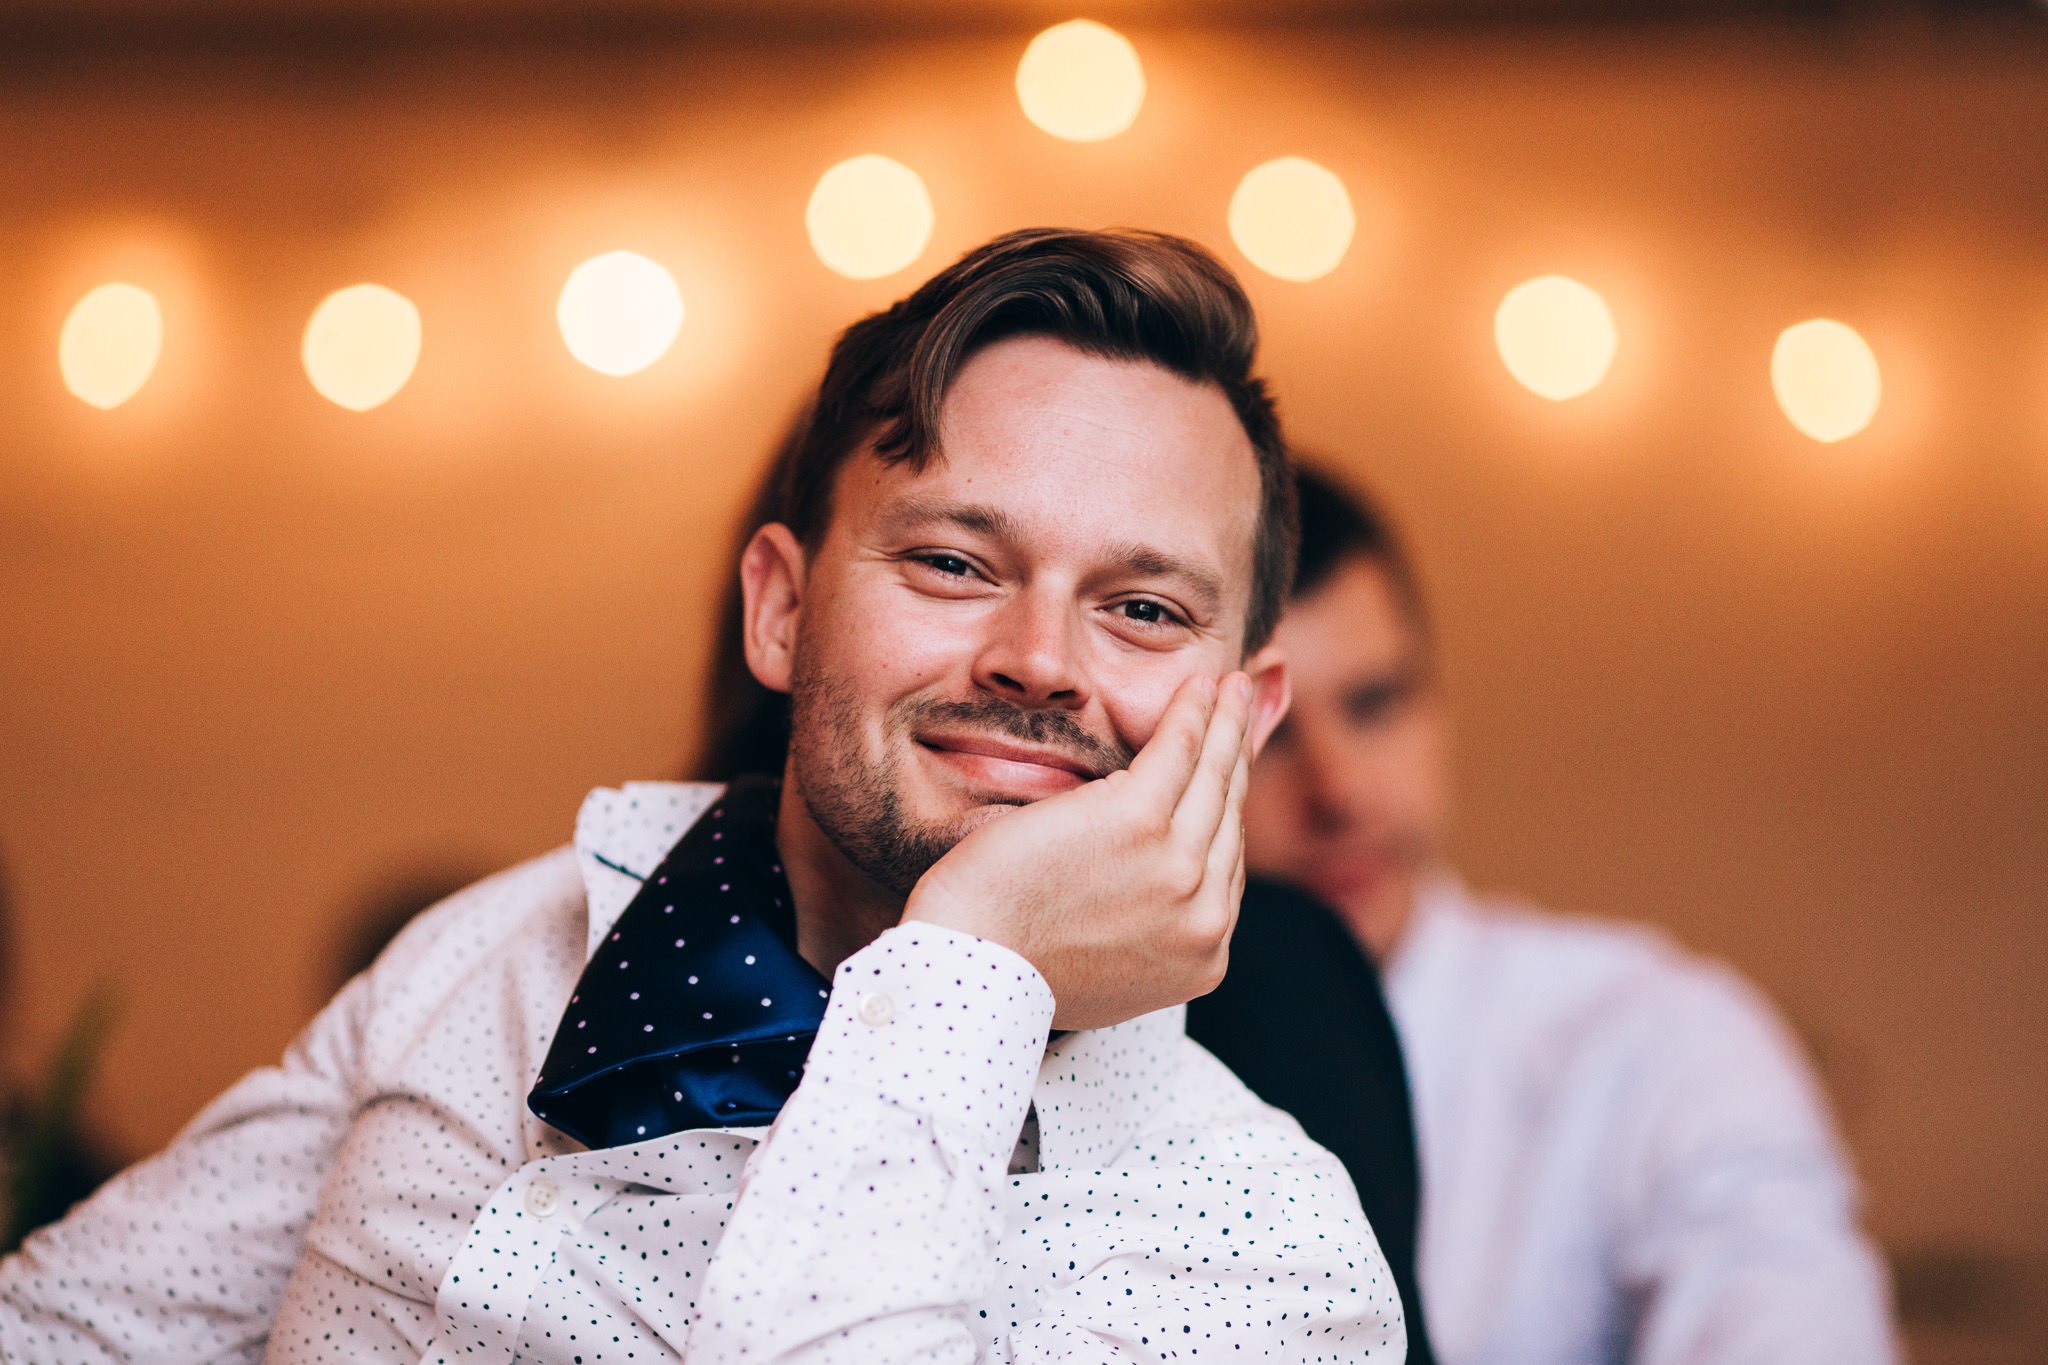 070_Canada-documentary-wedding-photograp